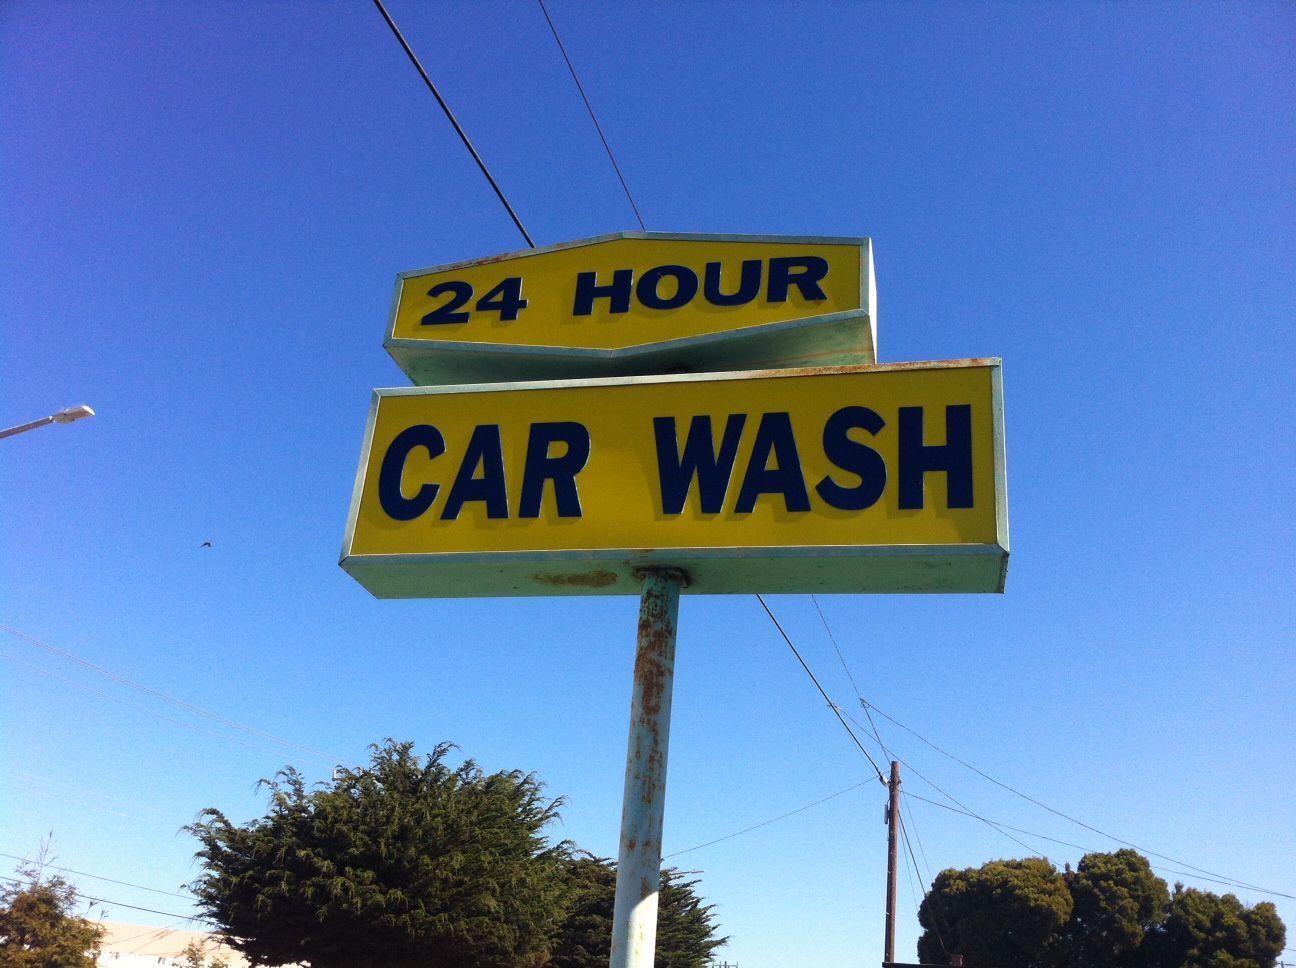 24 hour self serve car wash carwash vintage car wash